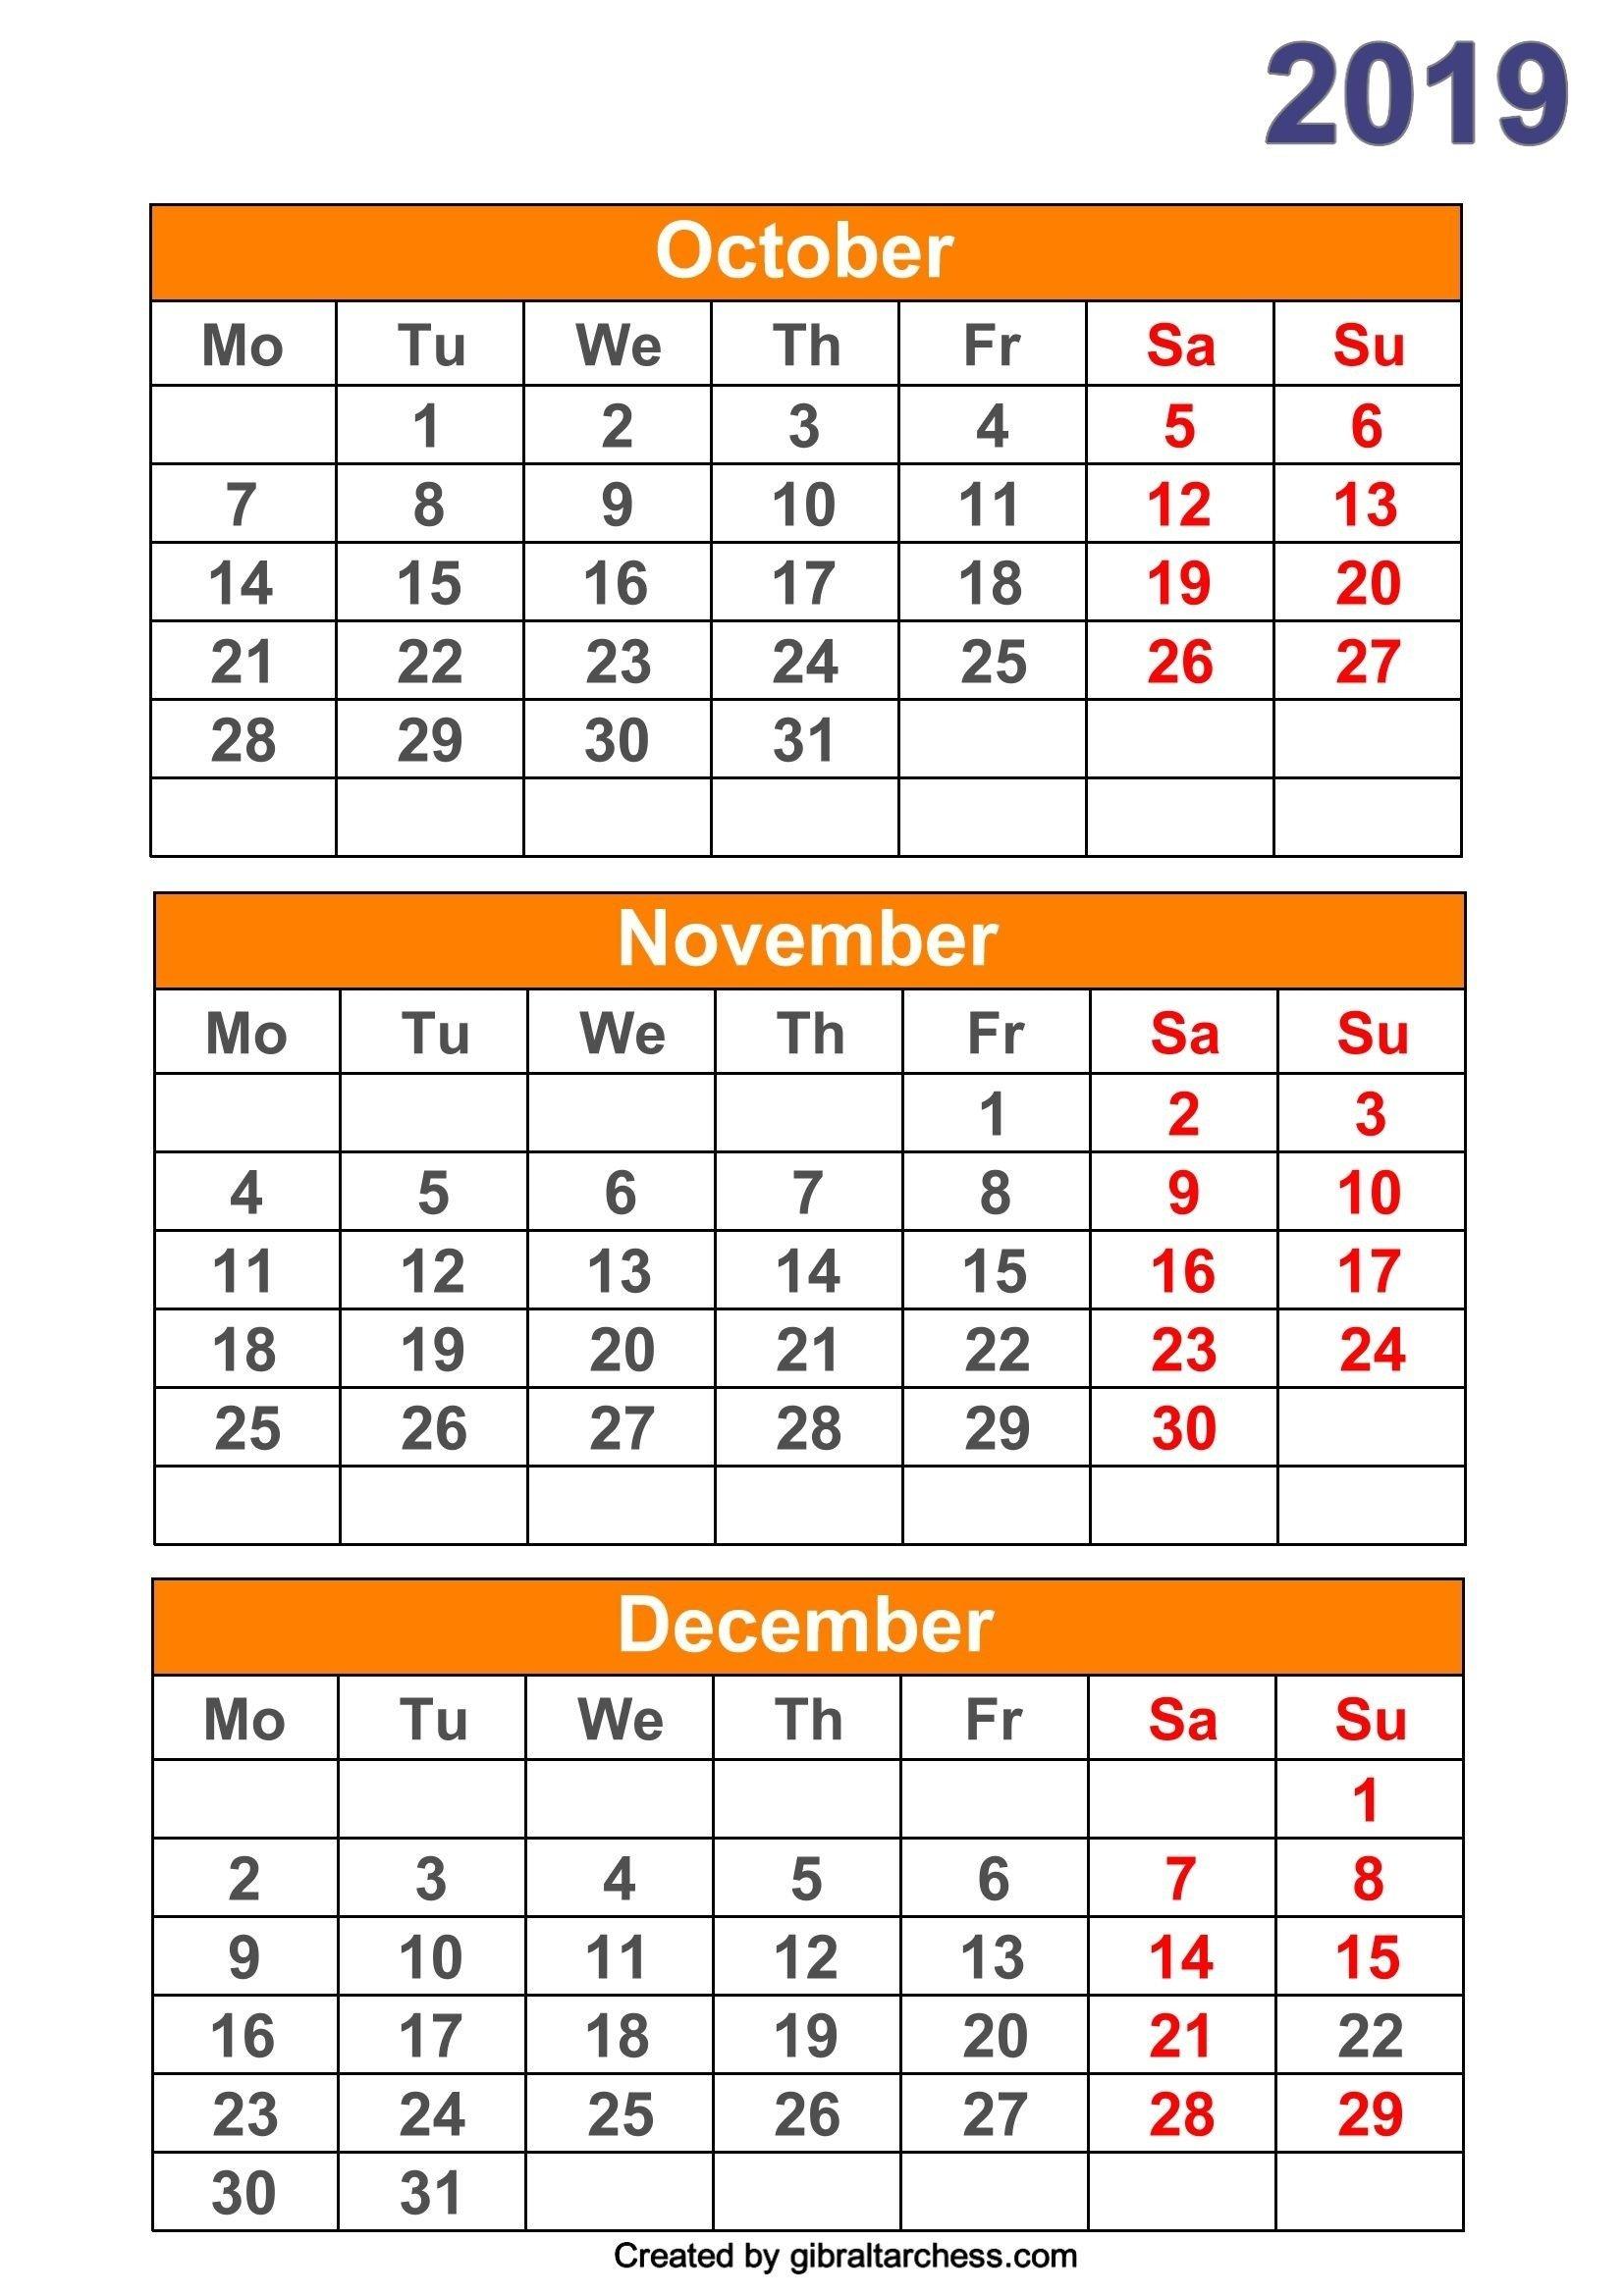 Calendar Templates 3Months Per Page | Calendar Template Free Printable Calendars By 3 Months